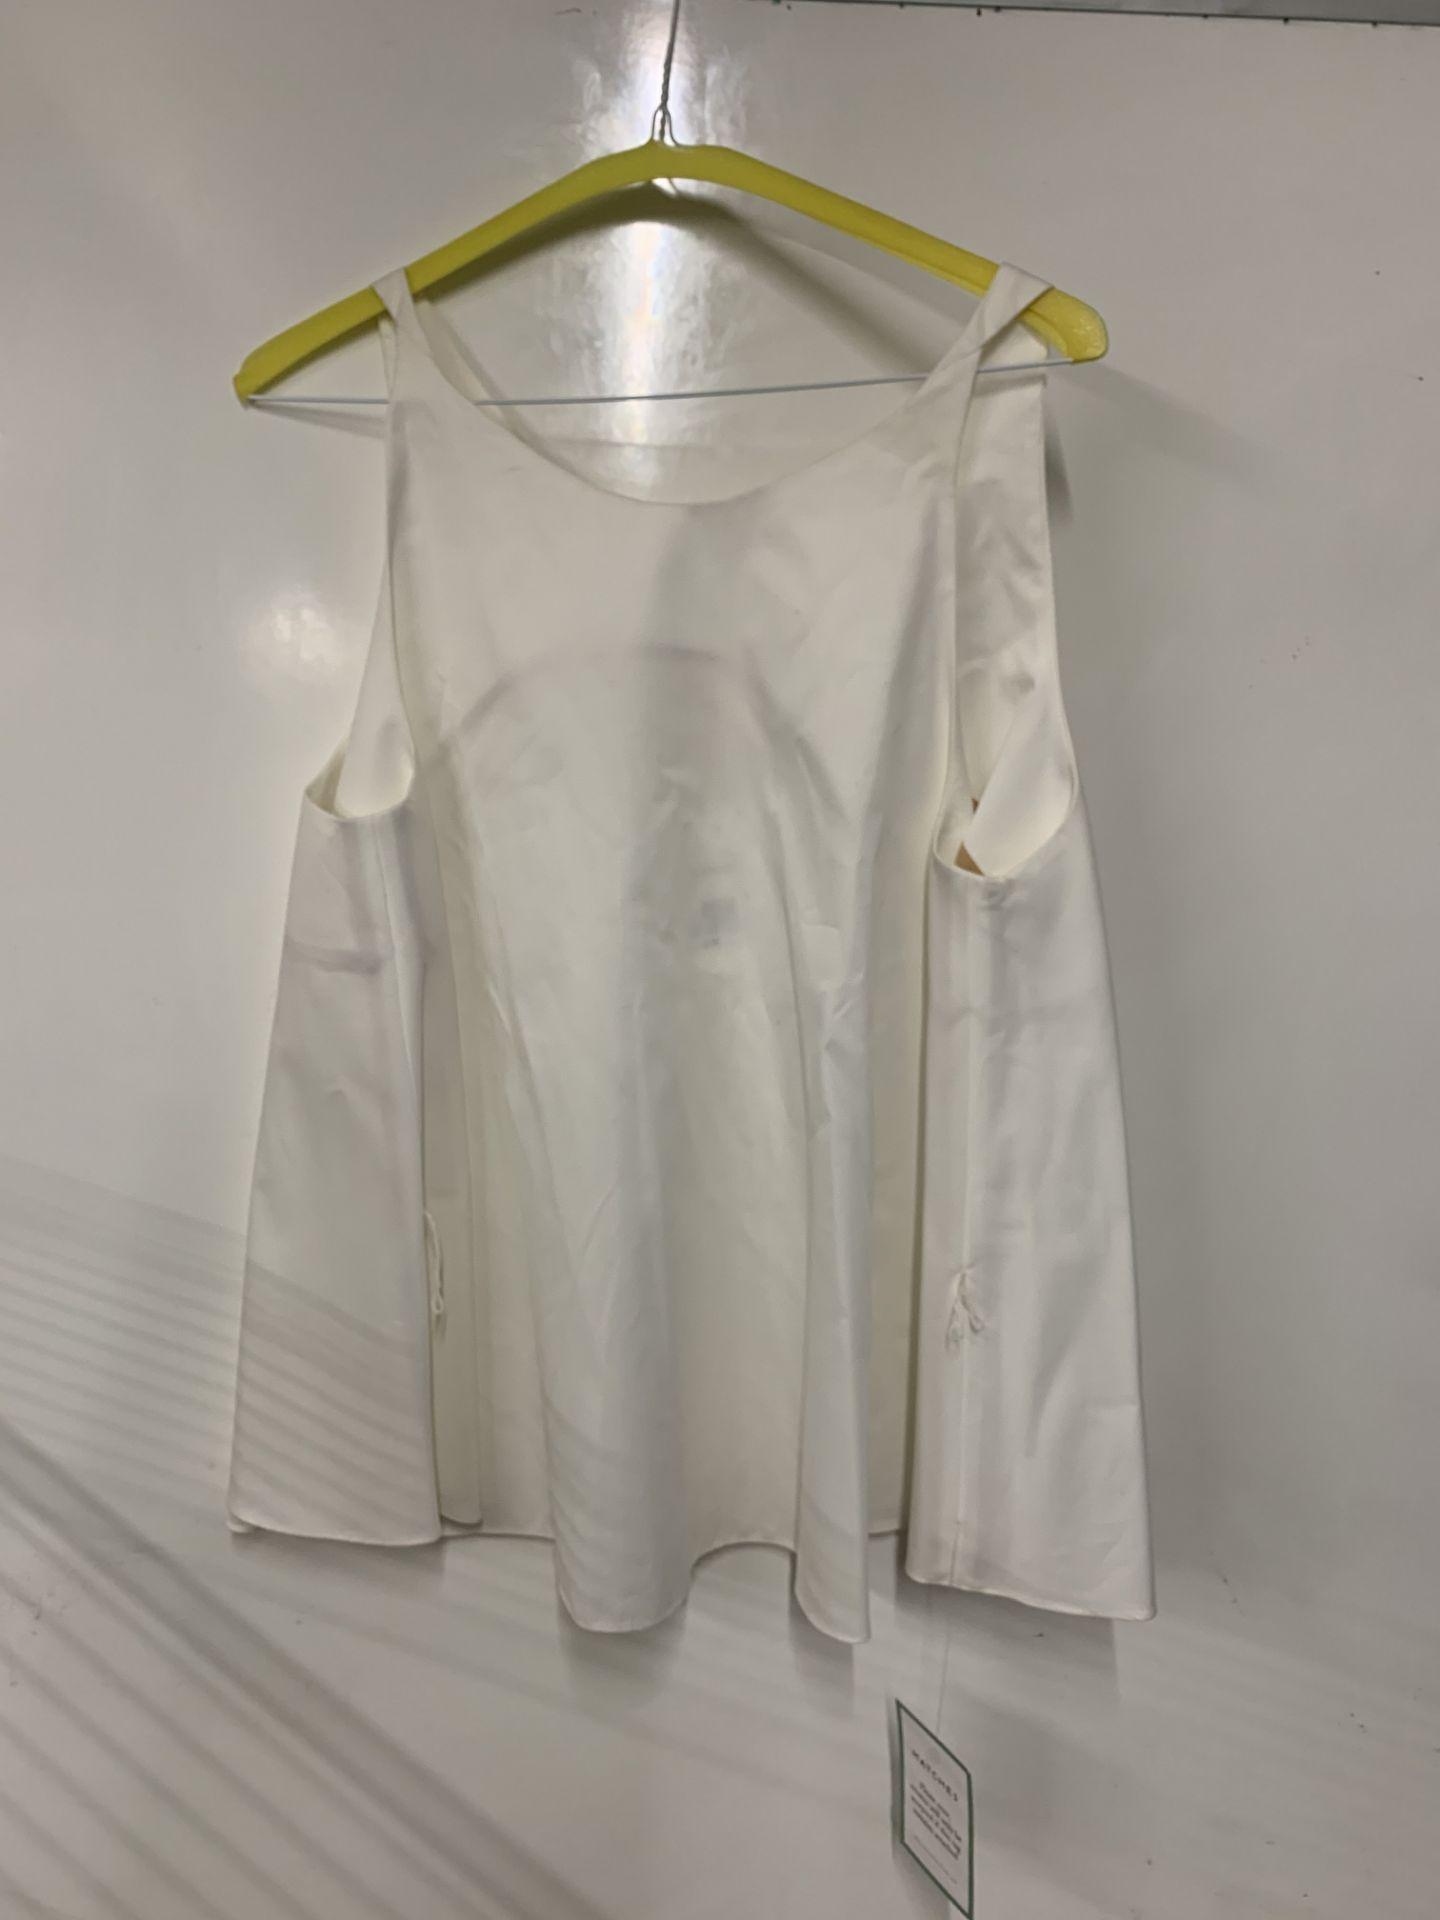 Lot 29 - Chloe tops women's antique sleeveless cotton blouse   RRP 435.00